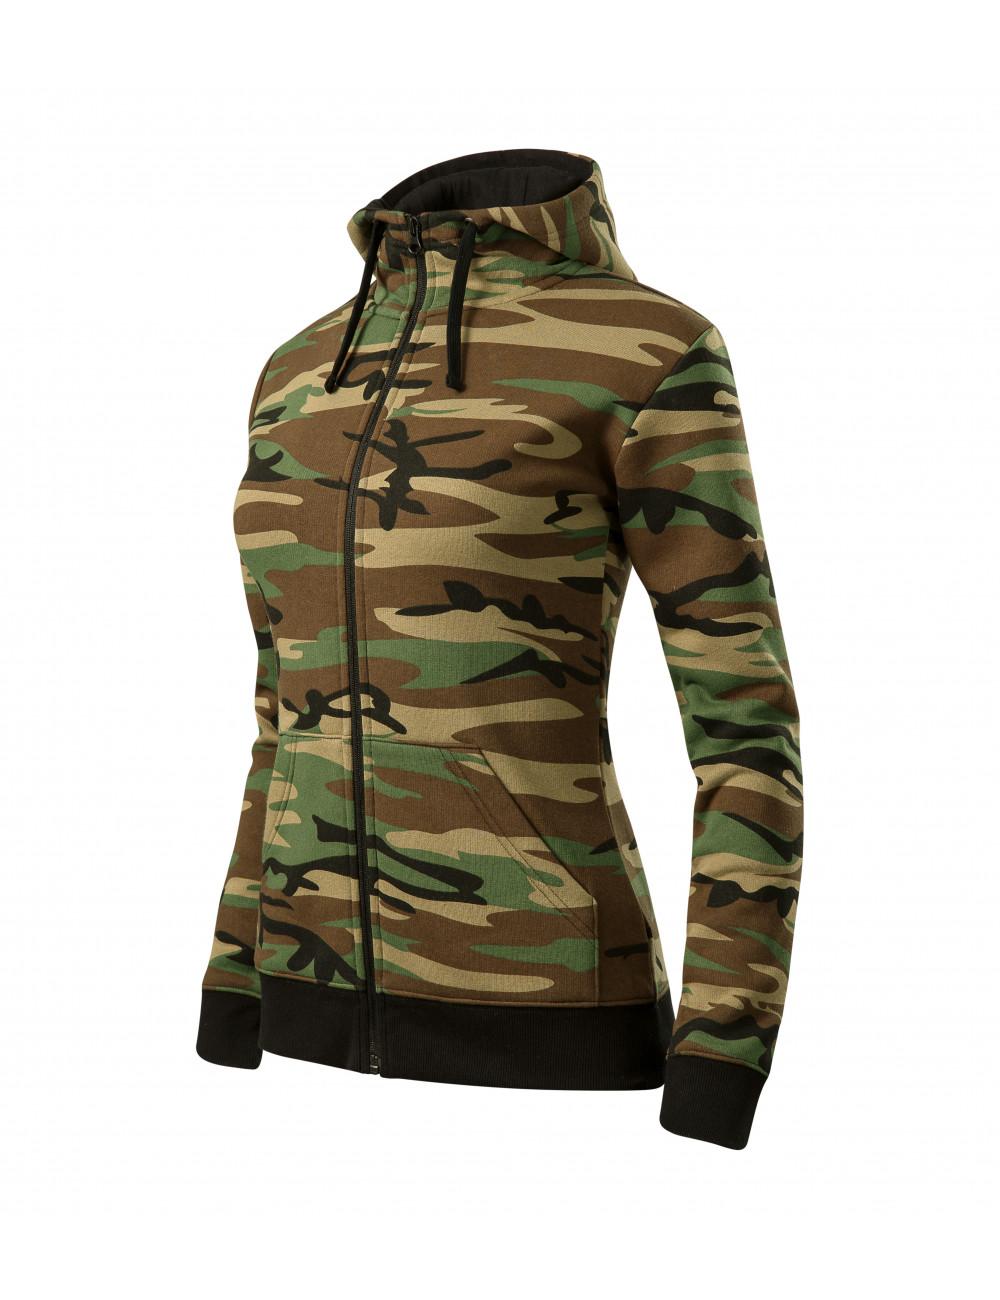 Adler MALFINI Bluza damska Camo Zipper C20 camouflage brown